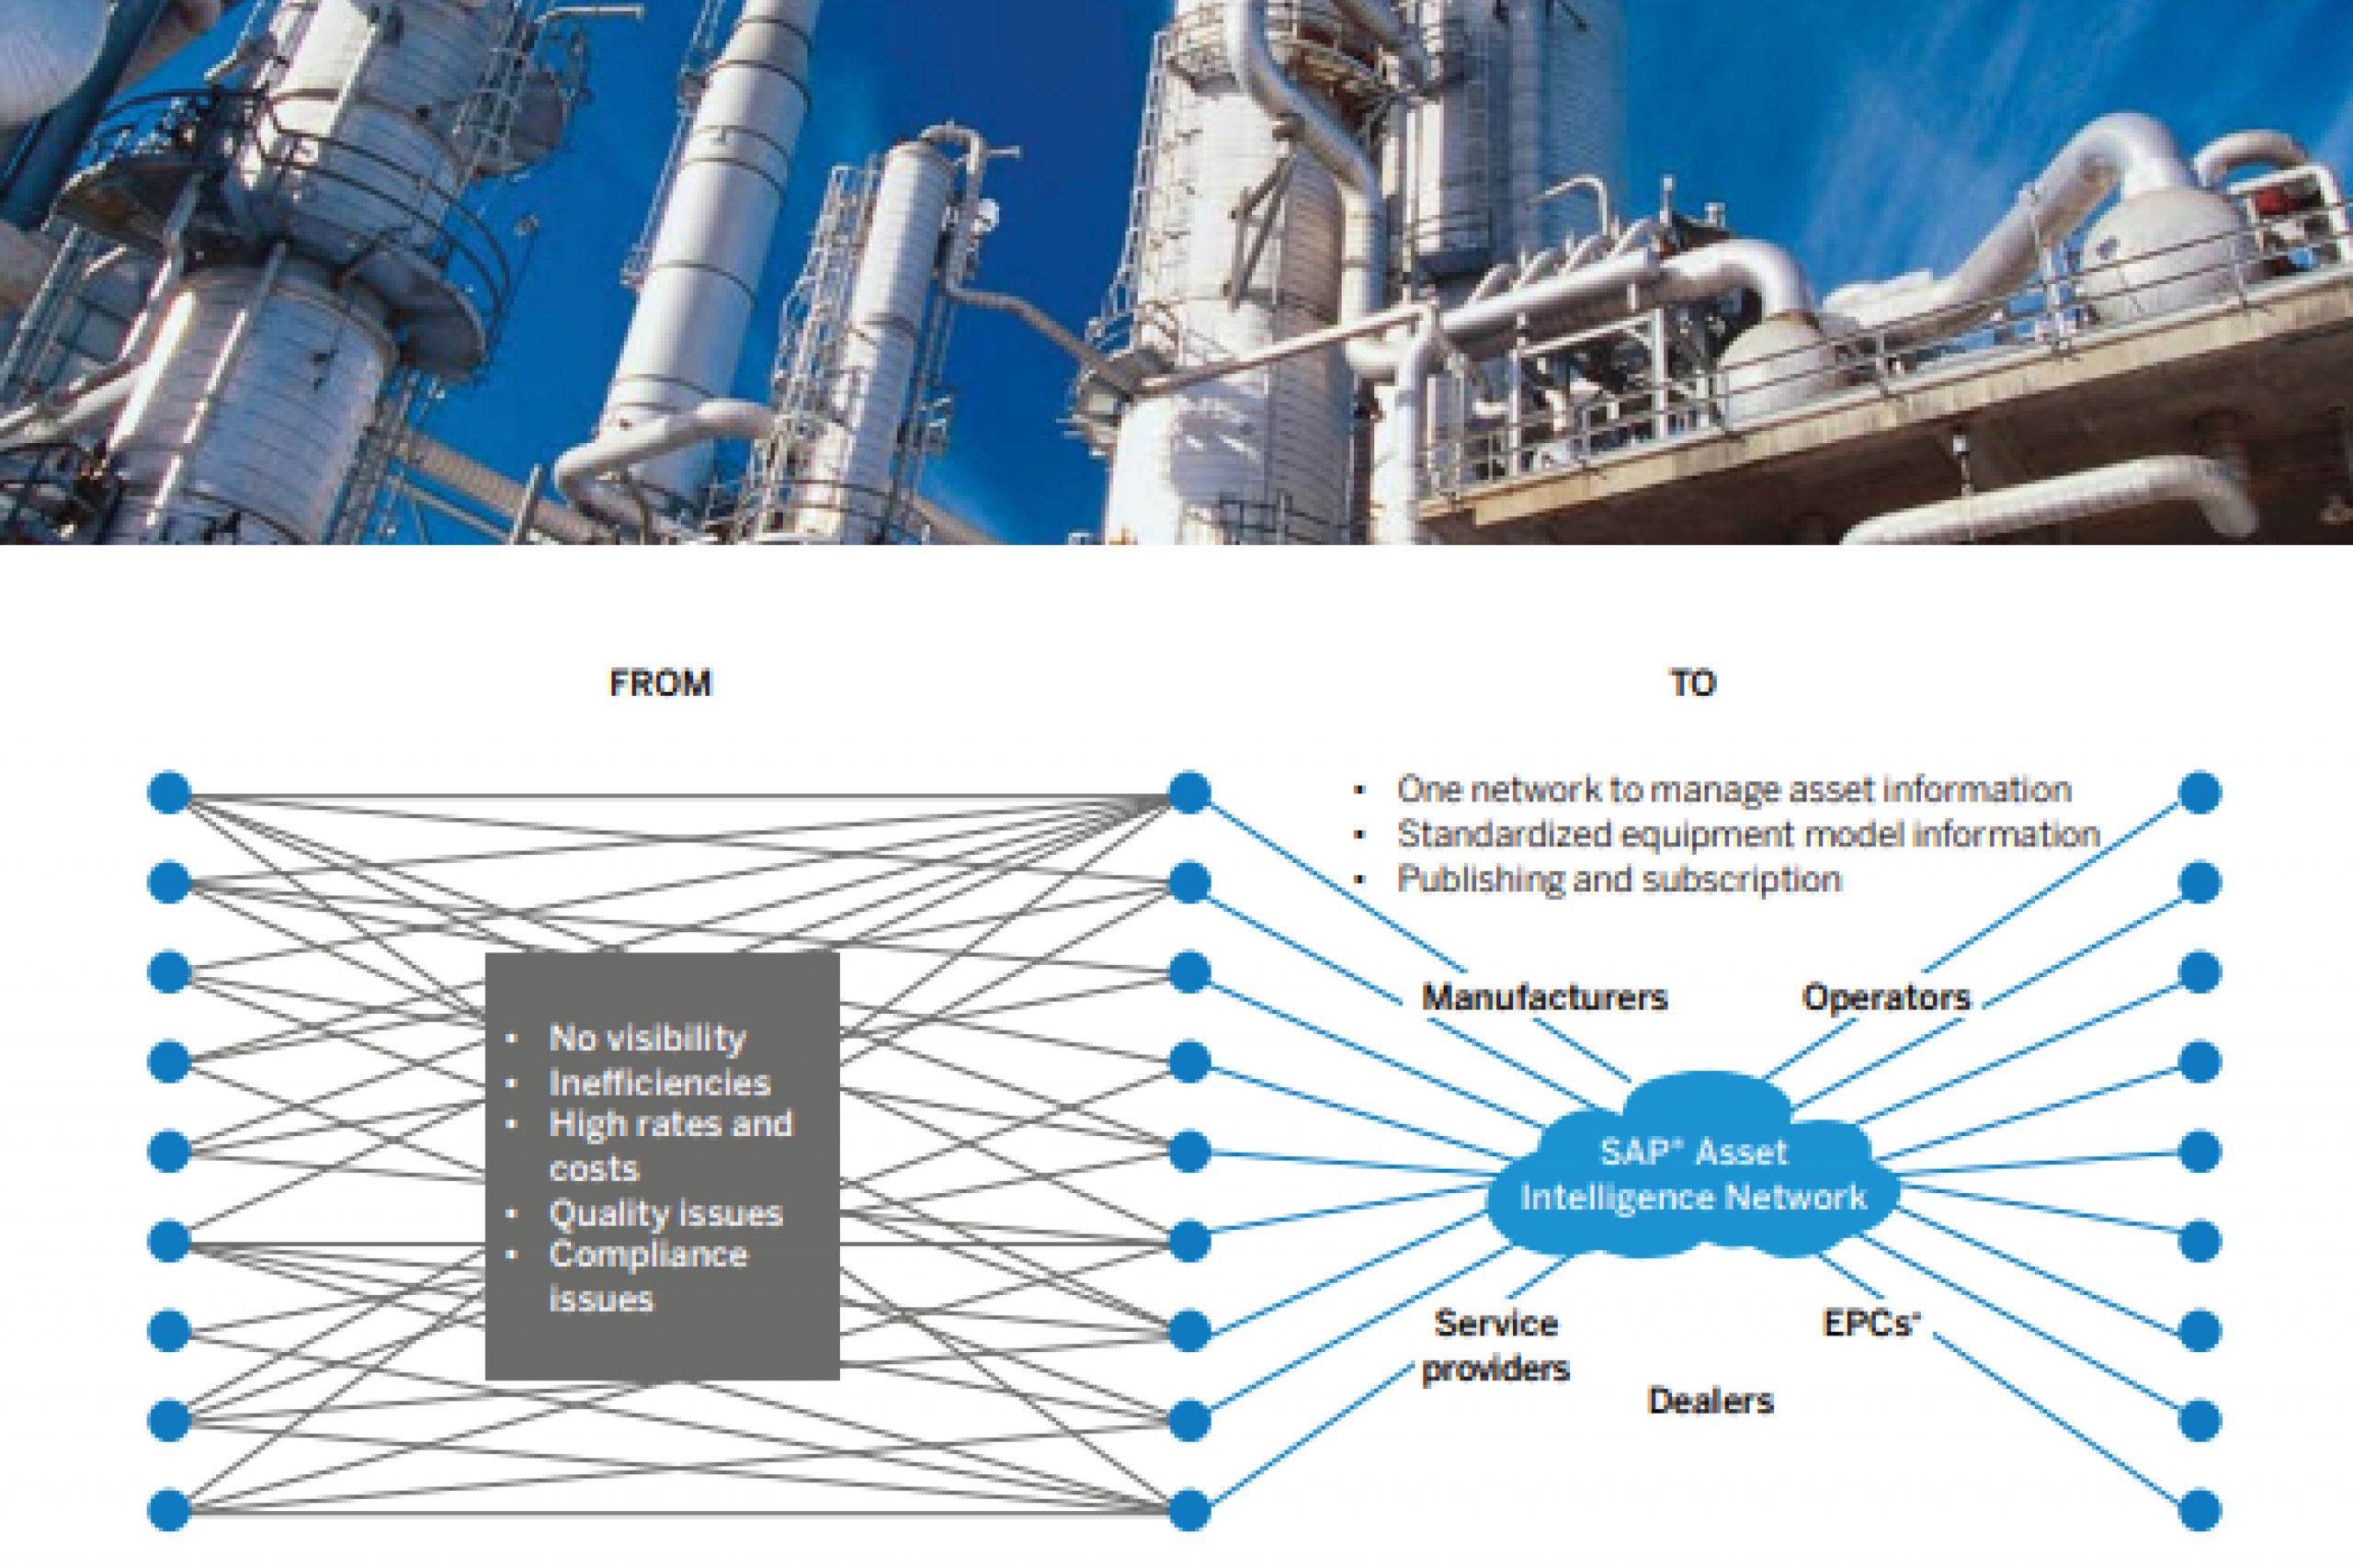 SAP AIN Overview